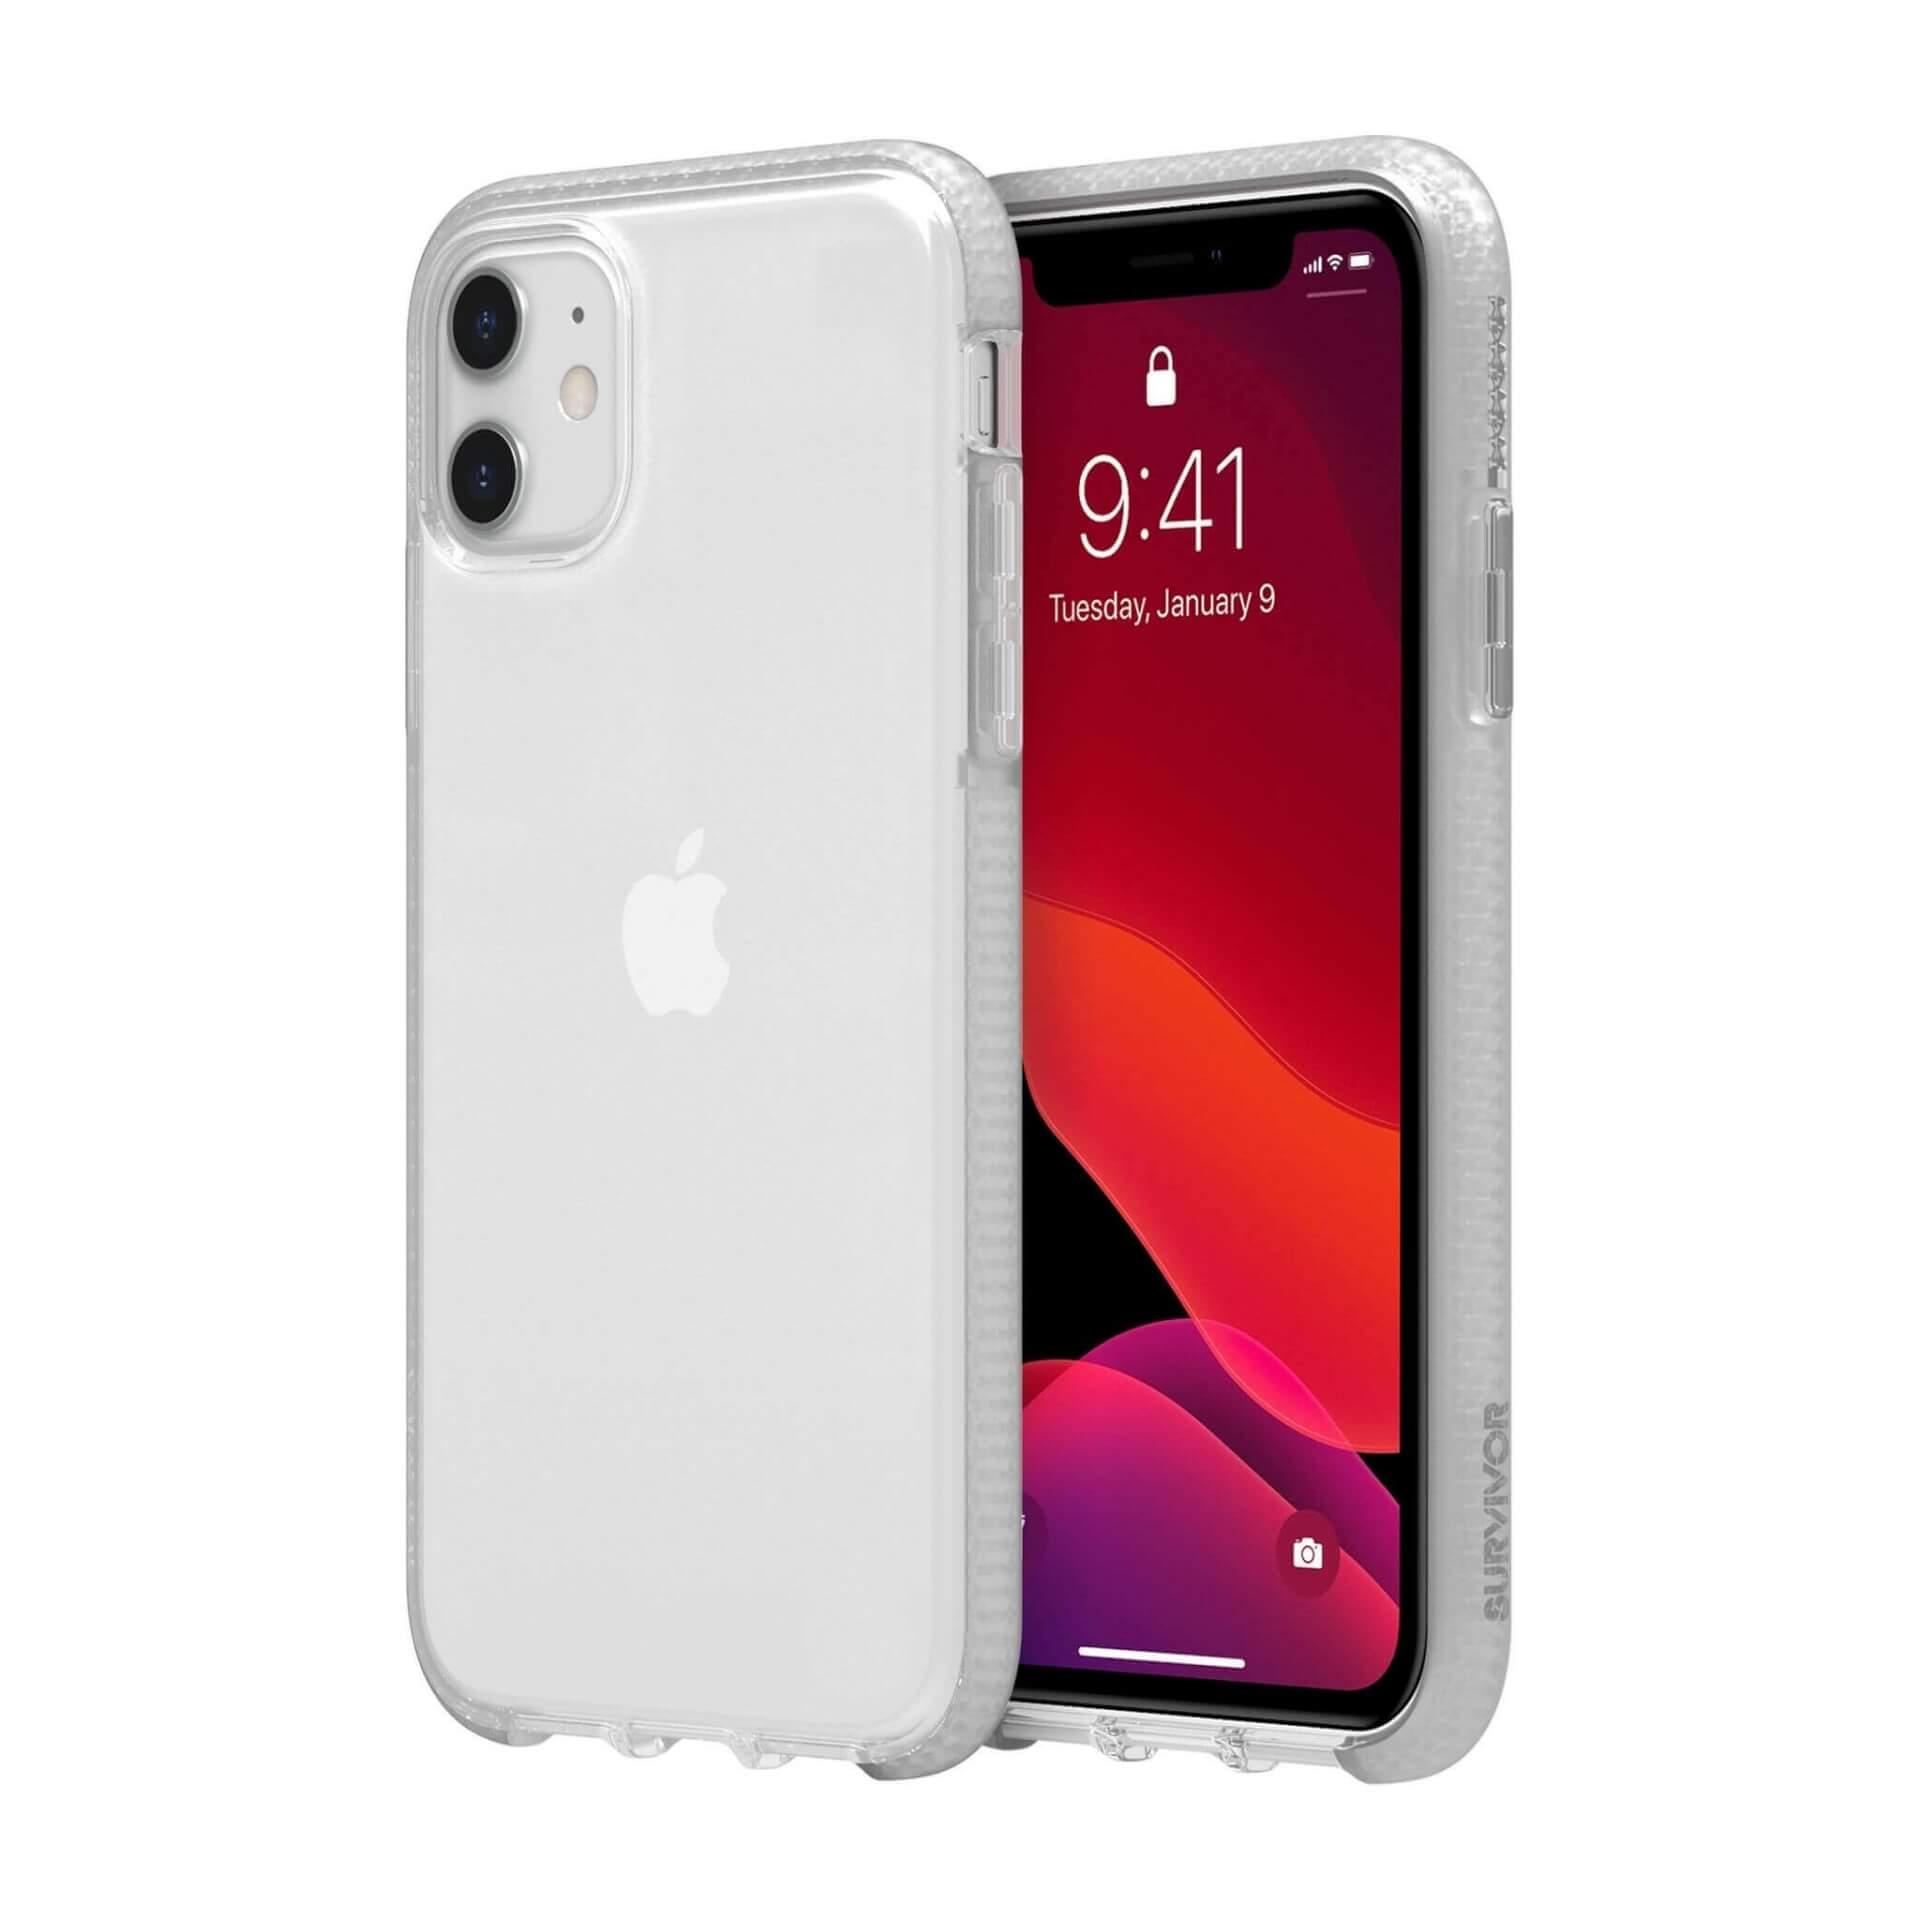 Griffin Survivor Clear Case — хибриден удароустойчив кейс за iPhone 11 (прозрачен) - 1